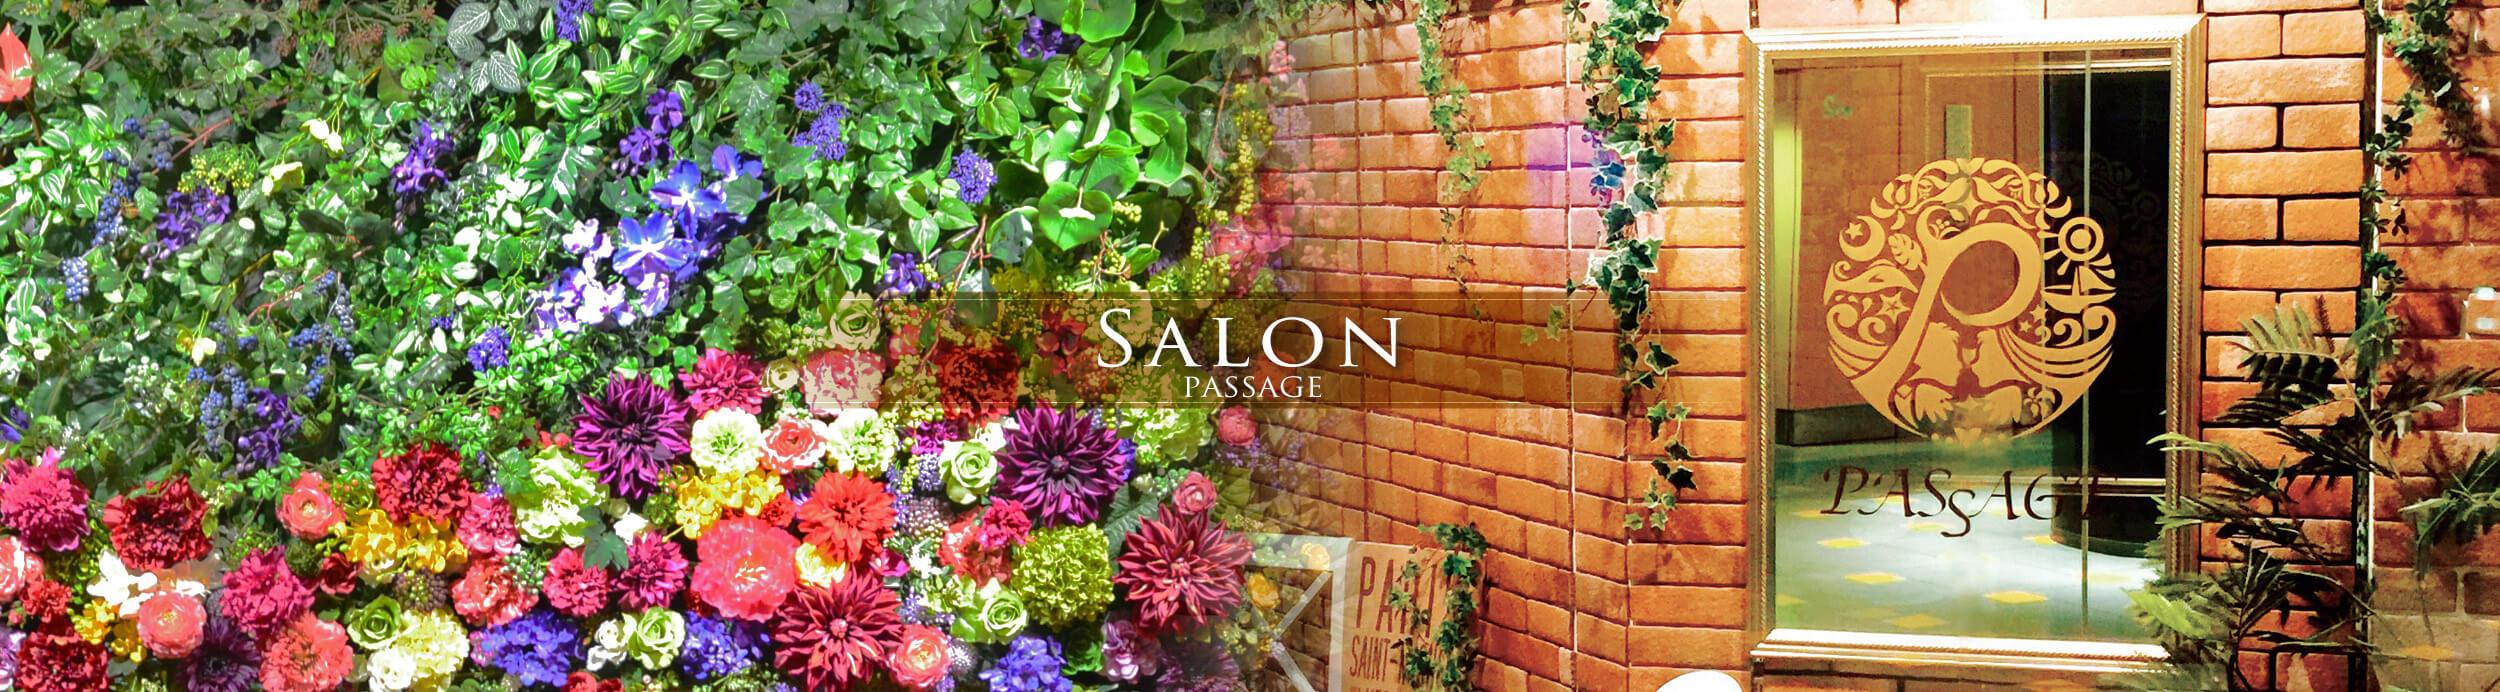 SALON passage|パッサージュサロン